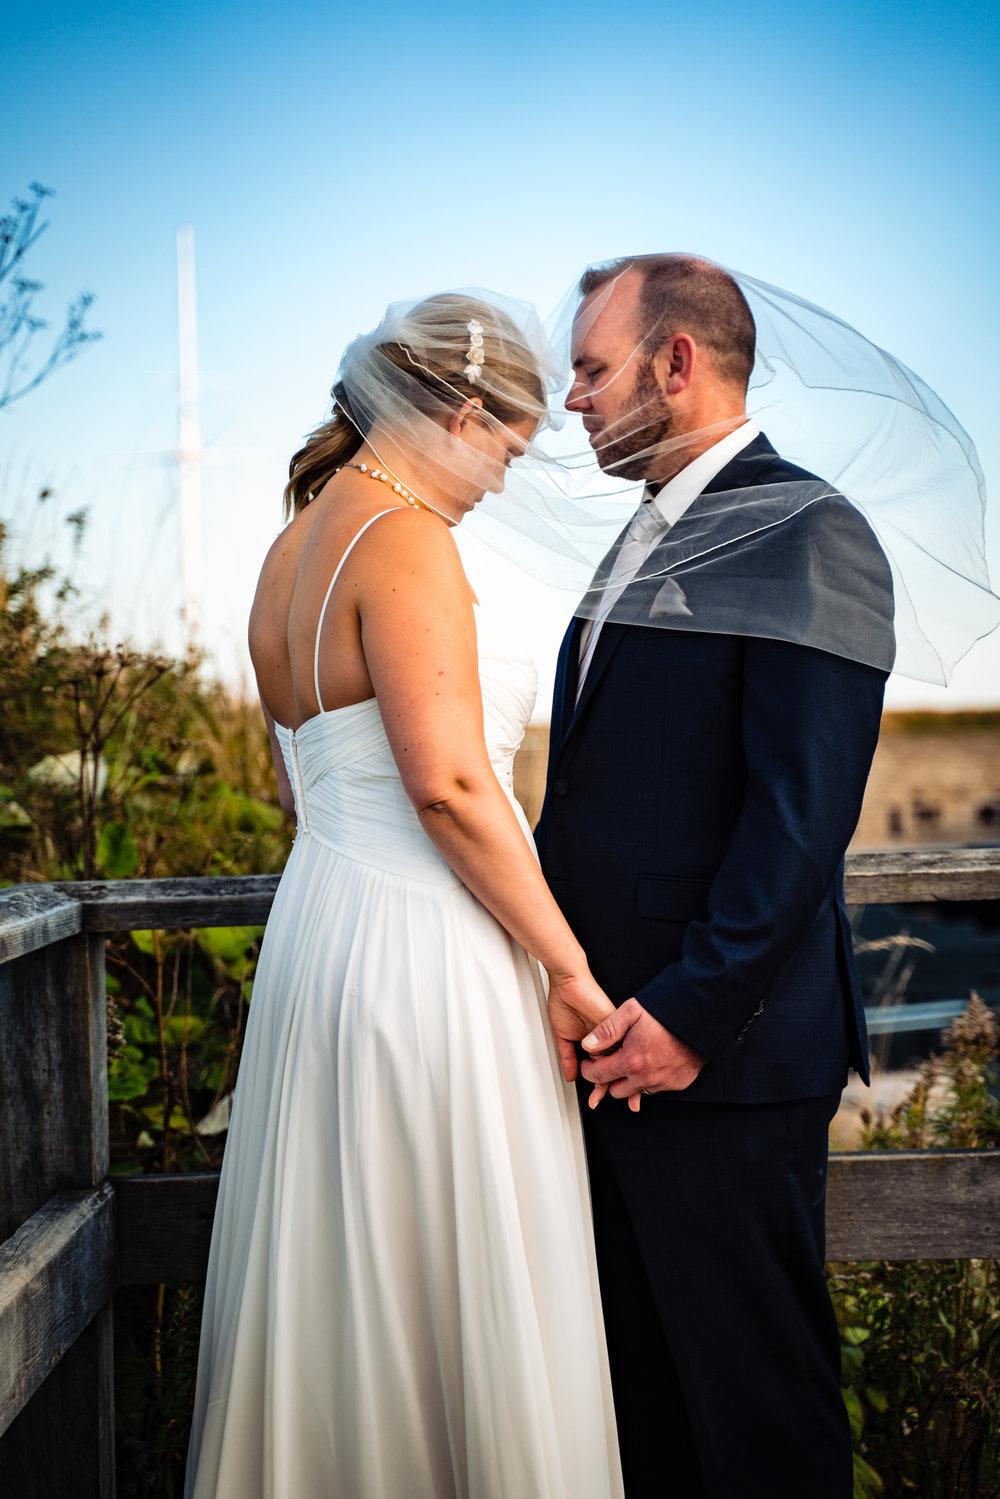 Halifax-wedding-citadelhill-venue-photography-fall-photographers-novascotia-canada-ottawa (76 of 100).jpg